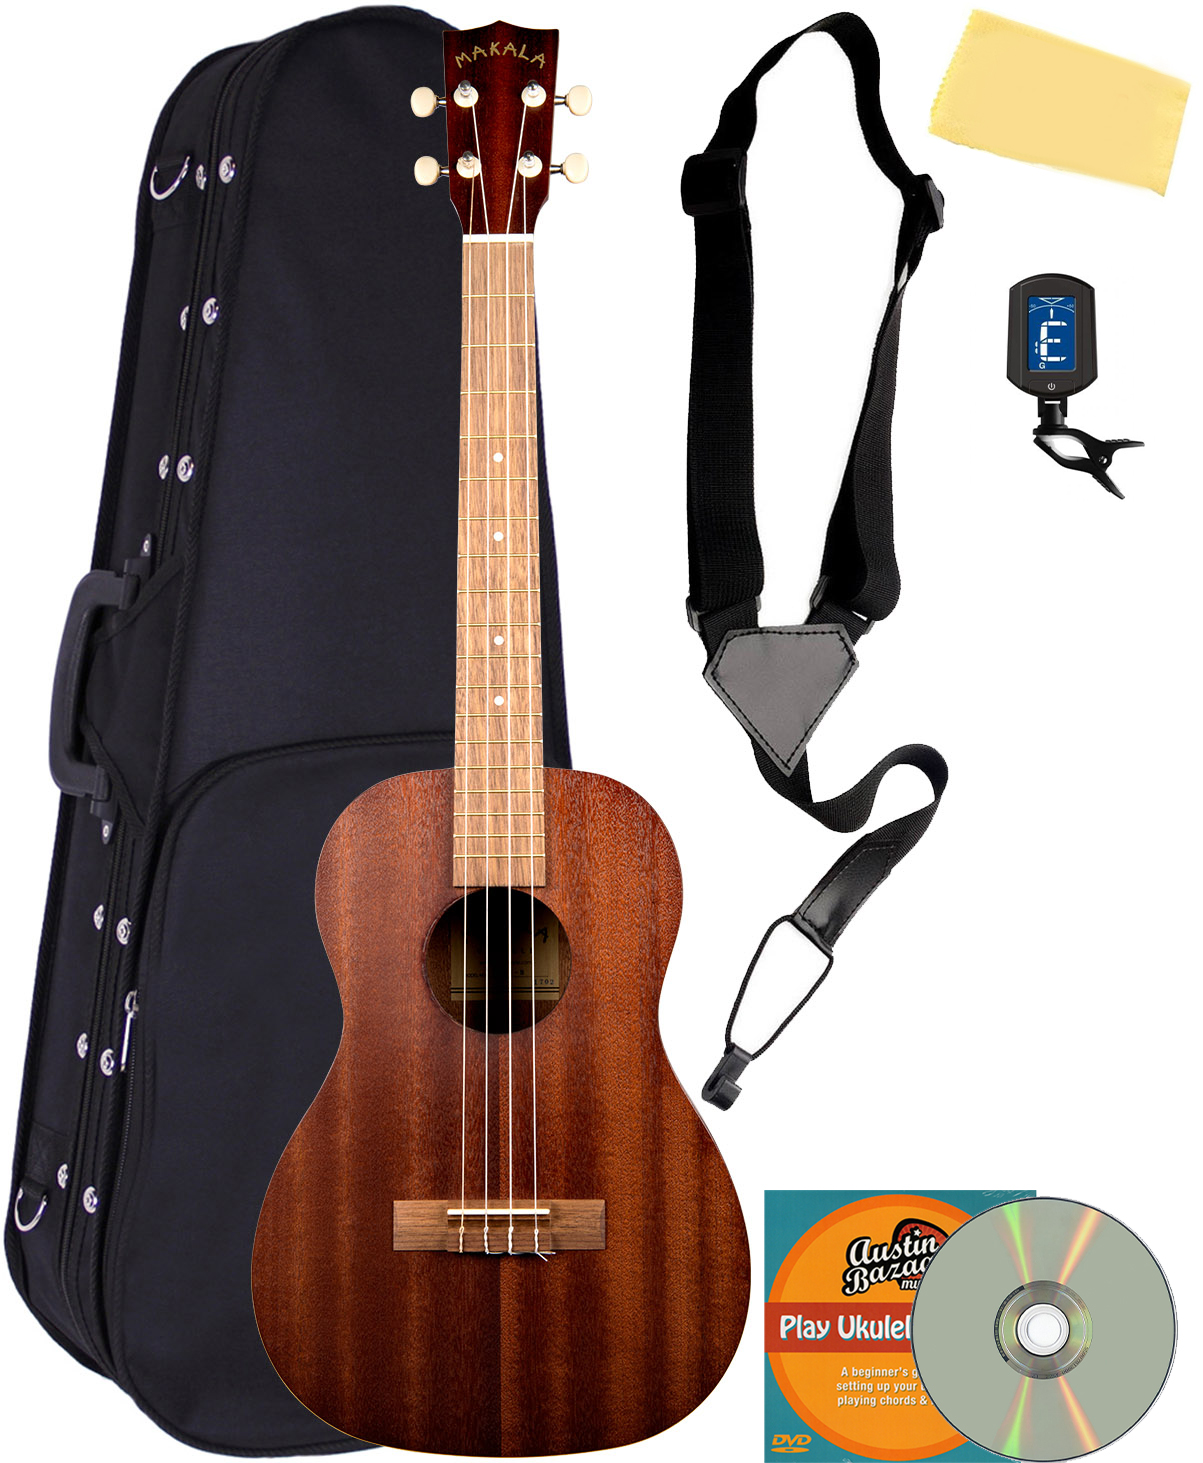 kala mk b makala baritone ukulele w hard case ebay. Black Bedroom Furniture Sets. Home Design Ideas